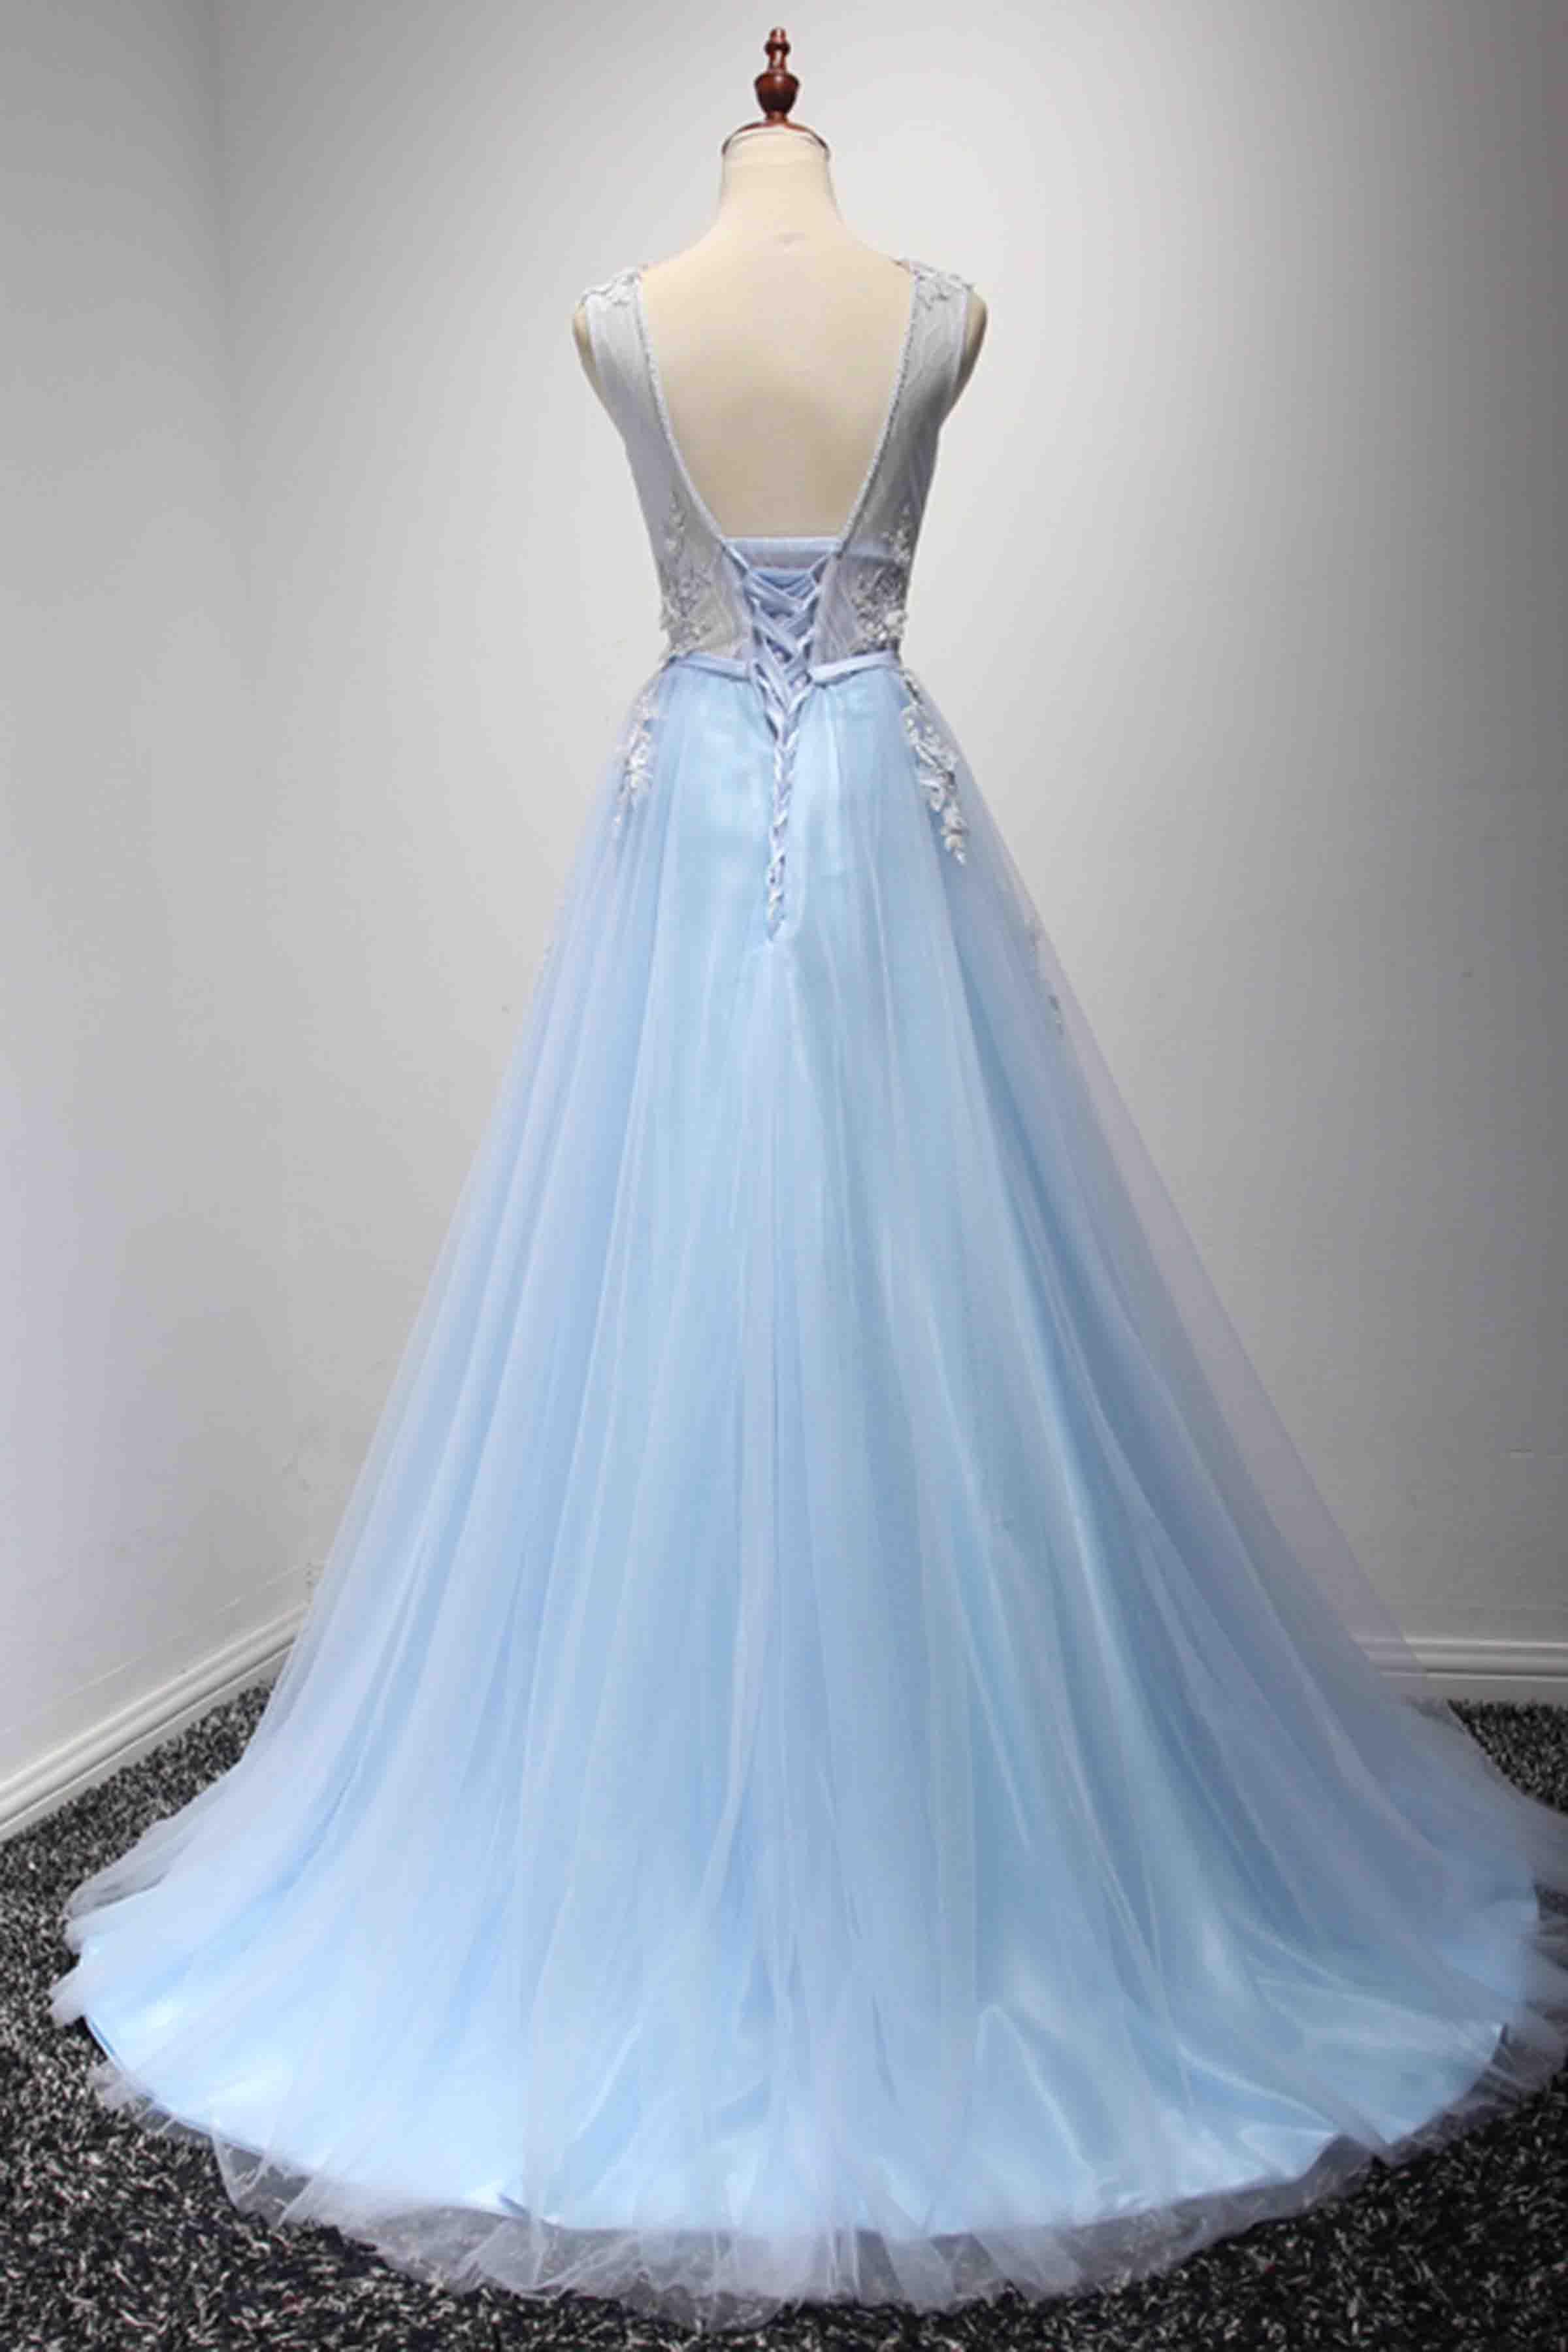 960580d4fb Light blue tulle lace applique V neck A-line long prom dresses  promdress